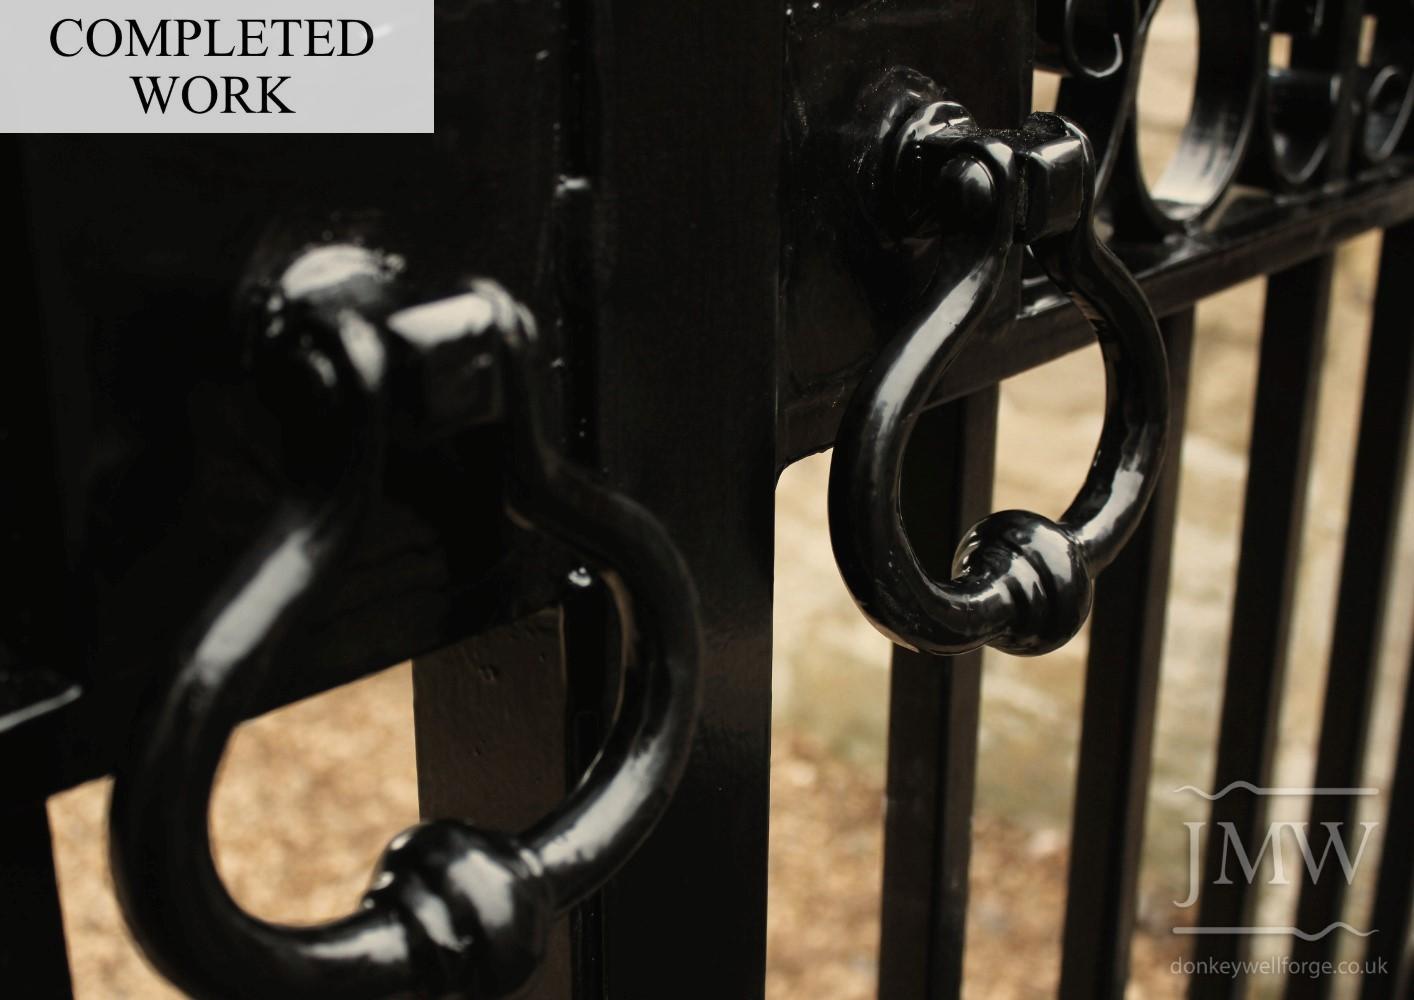 gates-details-scrolls-handles